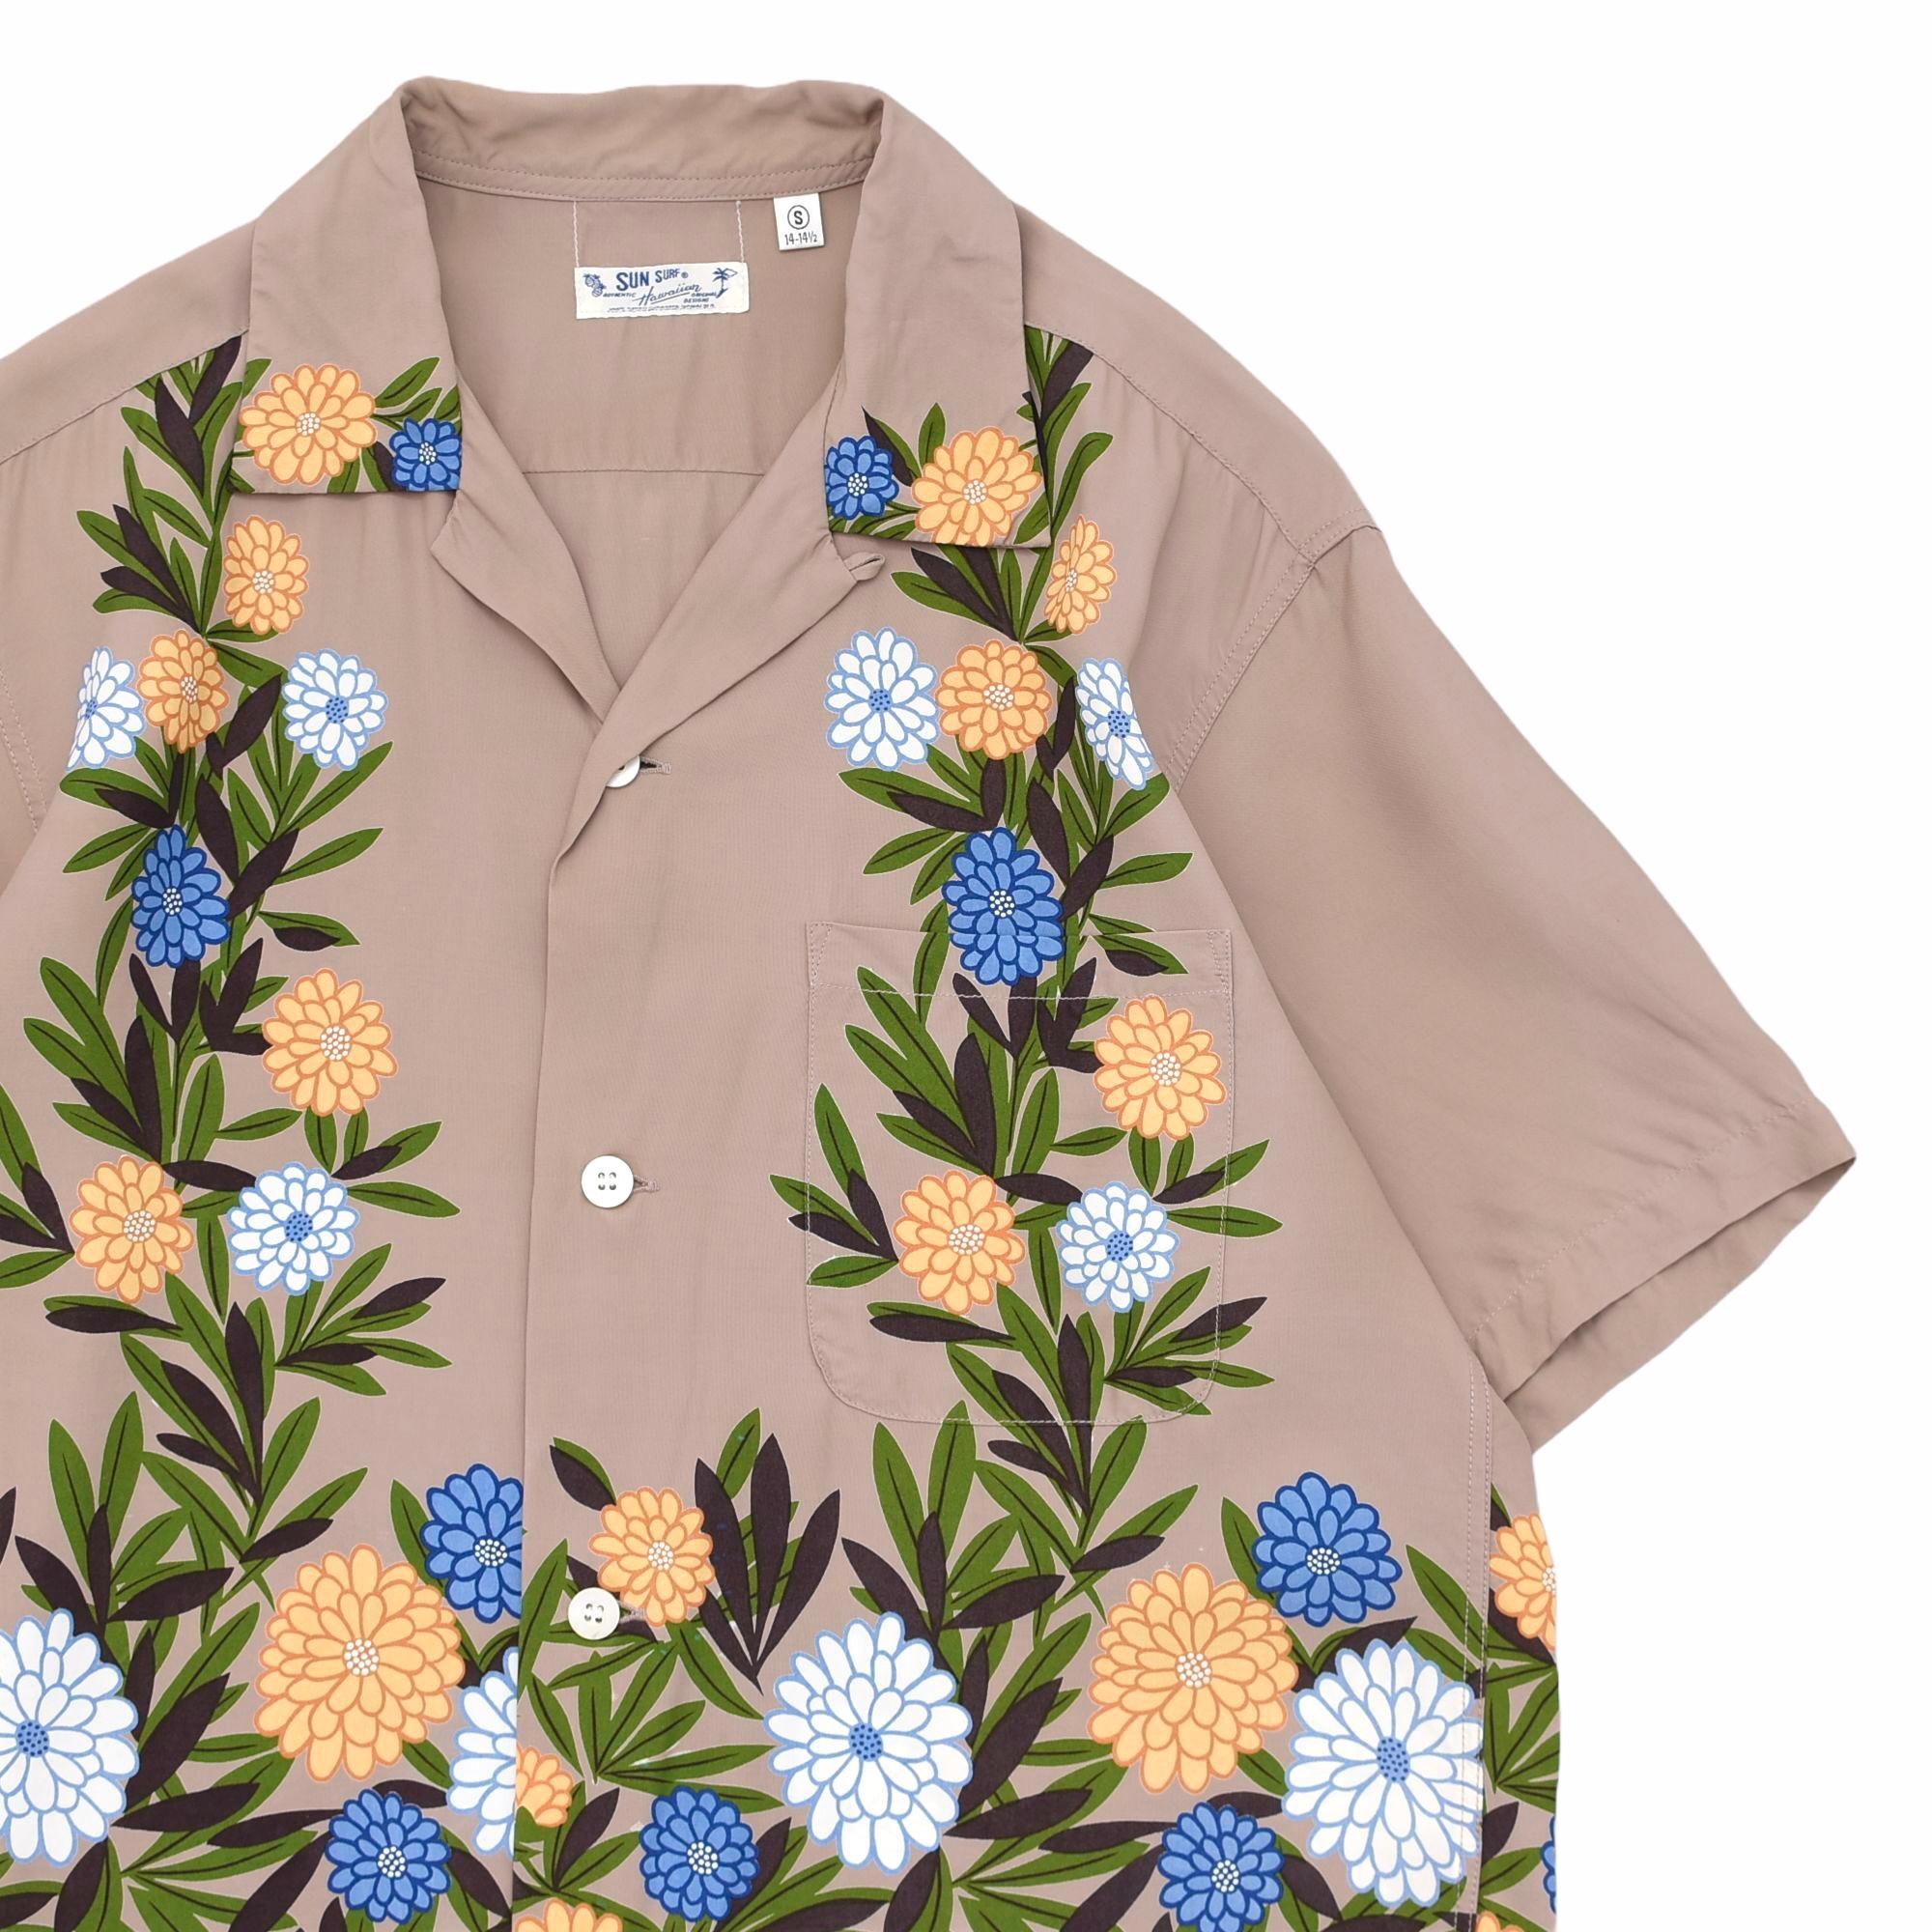 SUN SURF horizontal pattern aloha shirt